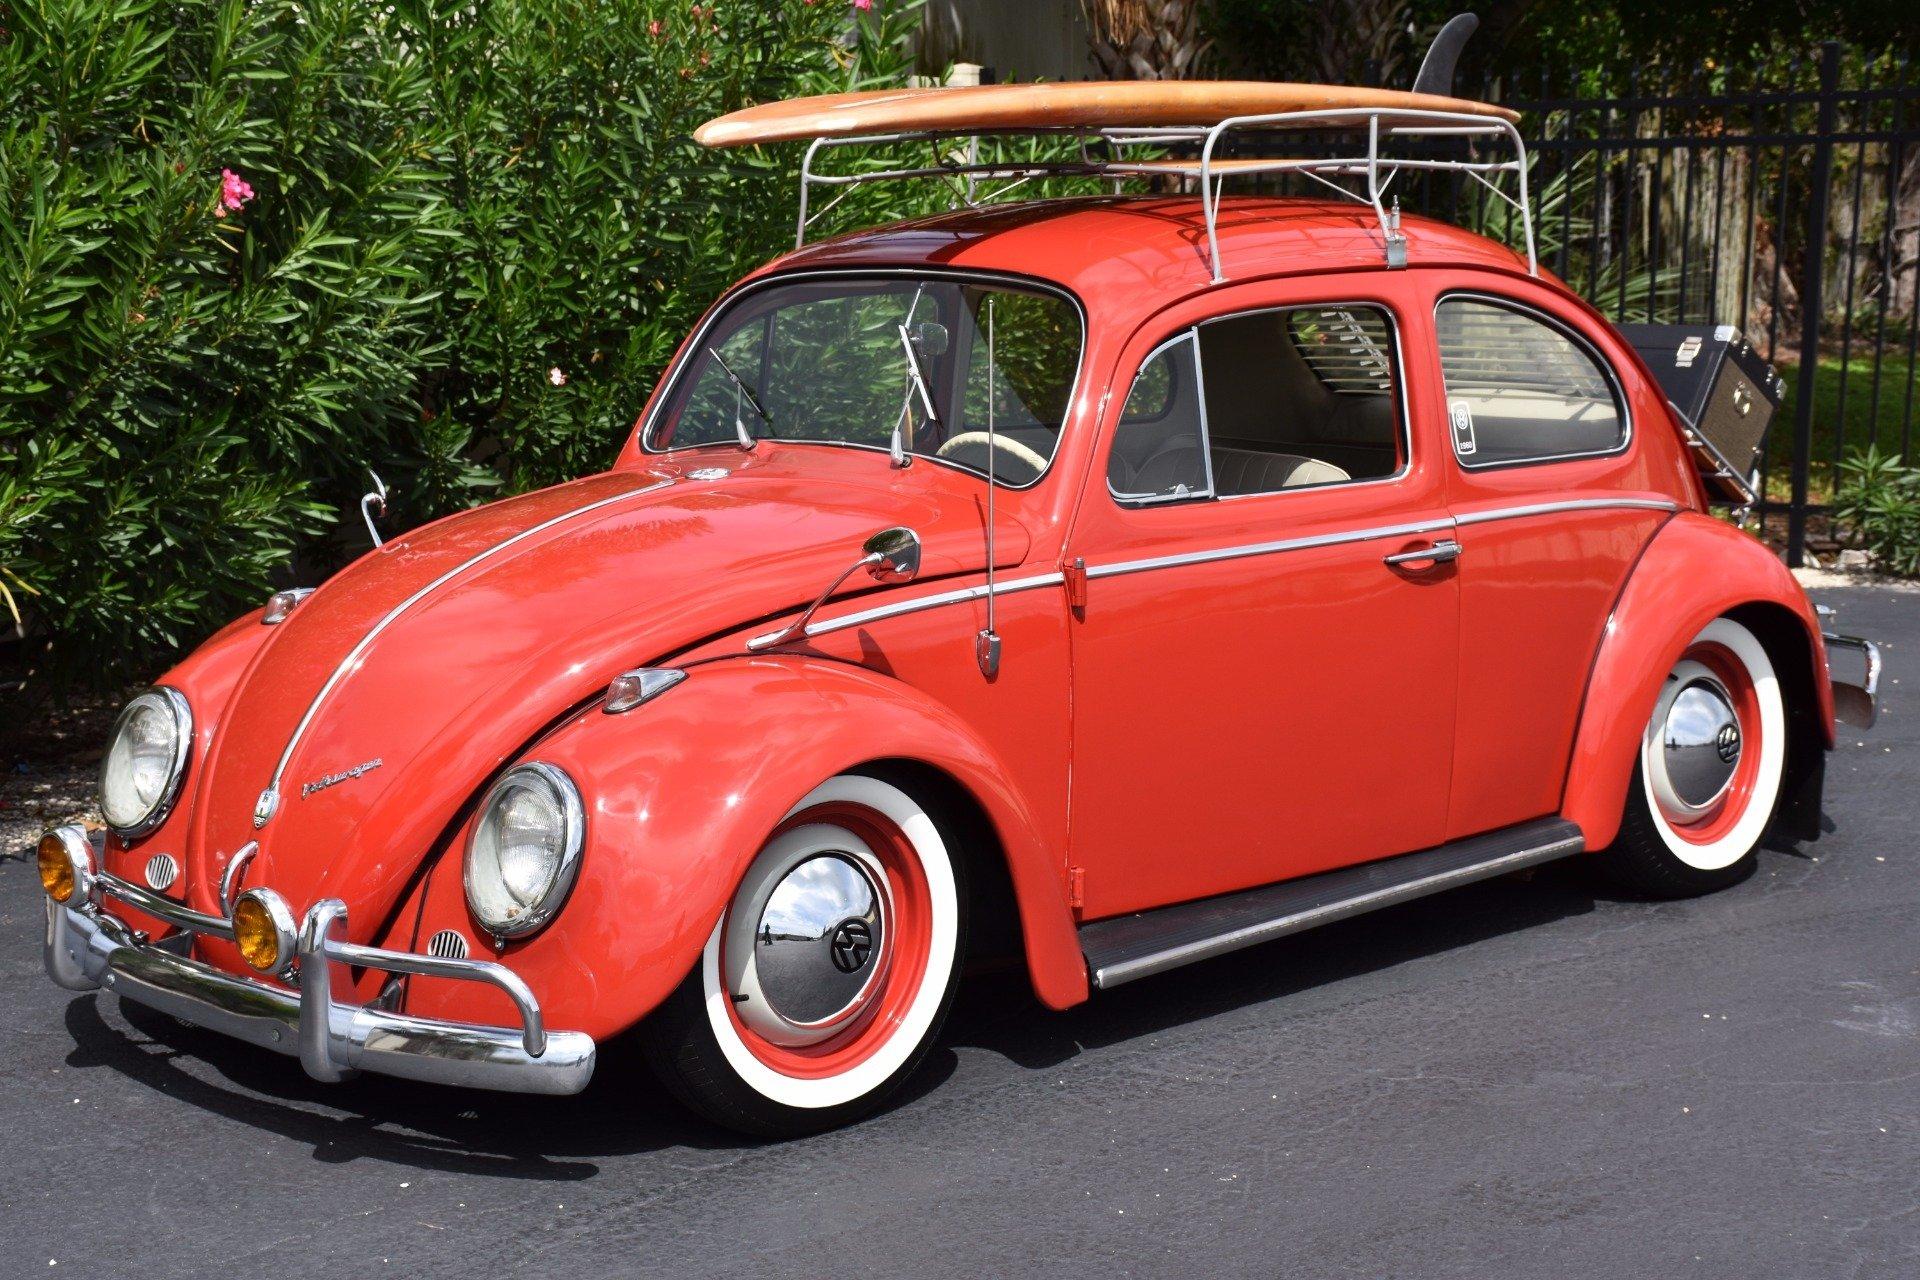 1960 Volkswagen Beetle Ideal Classic Cars Llc